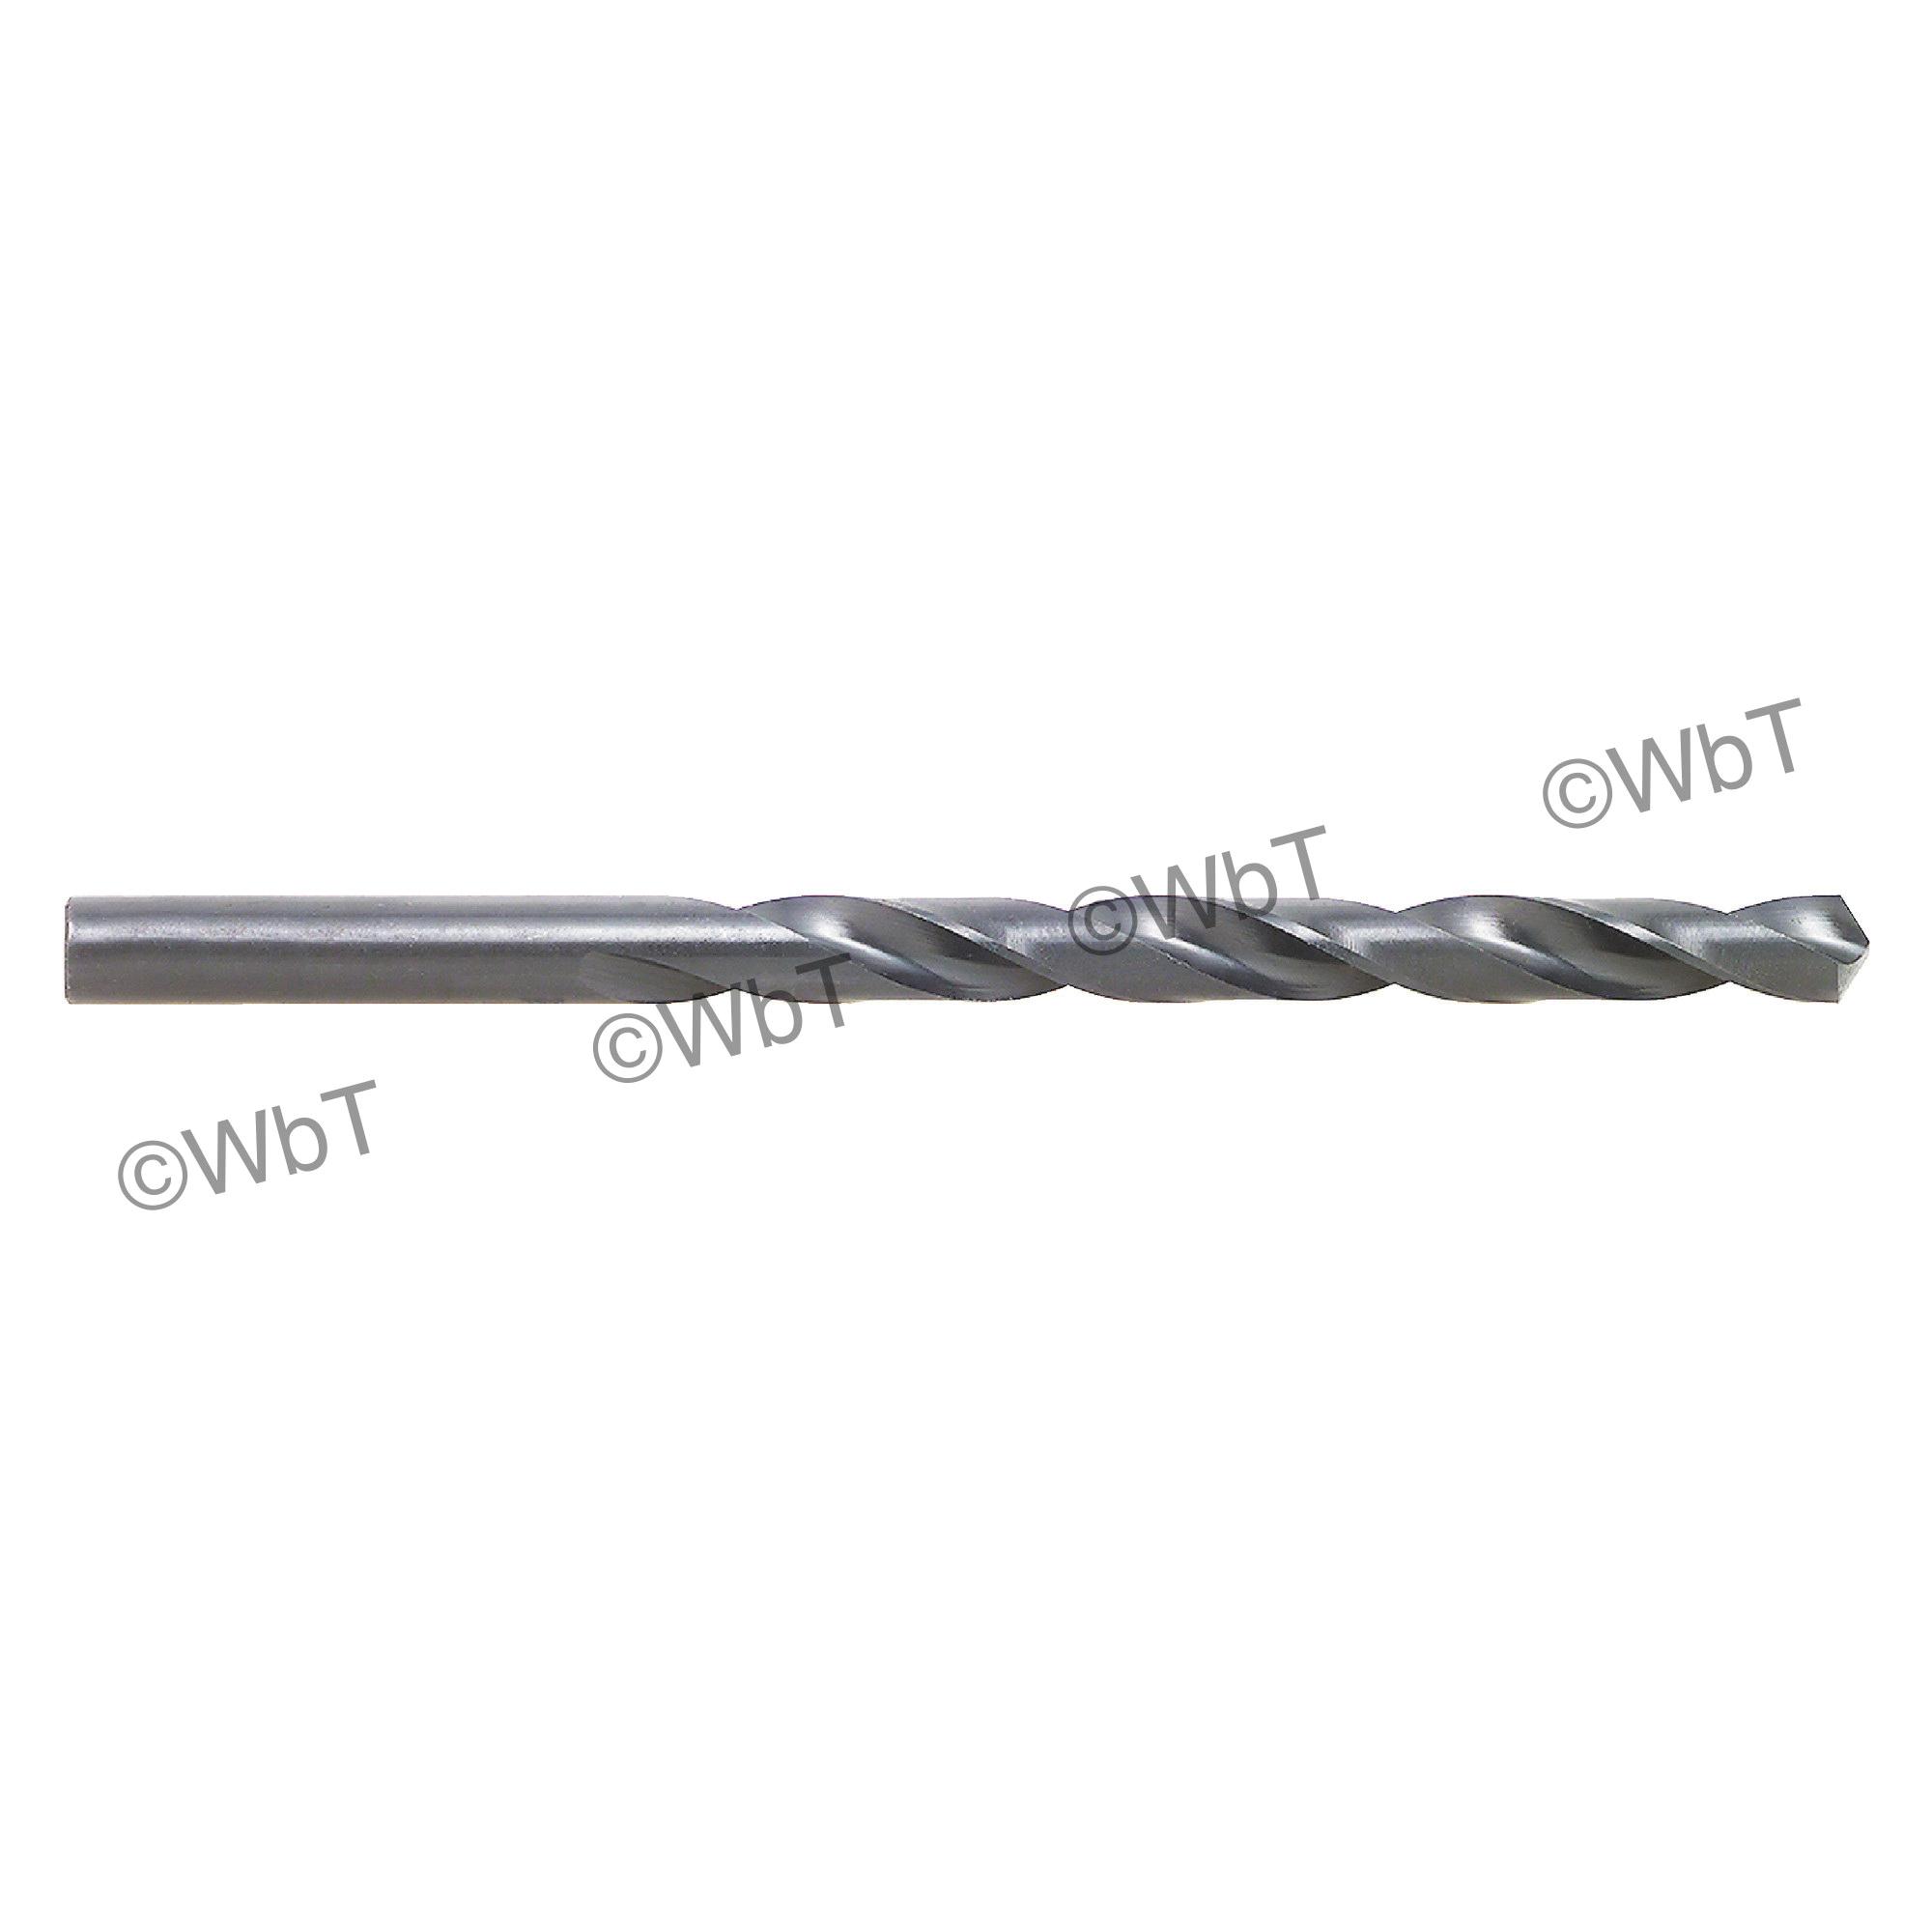 TTC 01-002-242 A2-HD Surface Treated Jobber Length Drill Bit, #42 Drill - Wire, 0.0935 in Drill - Decimal Inch, 135 deg Point, HSS, Black Oxide